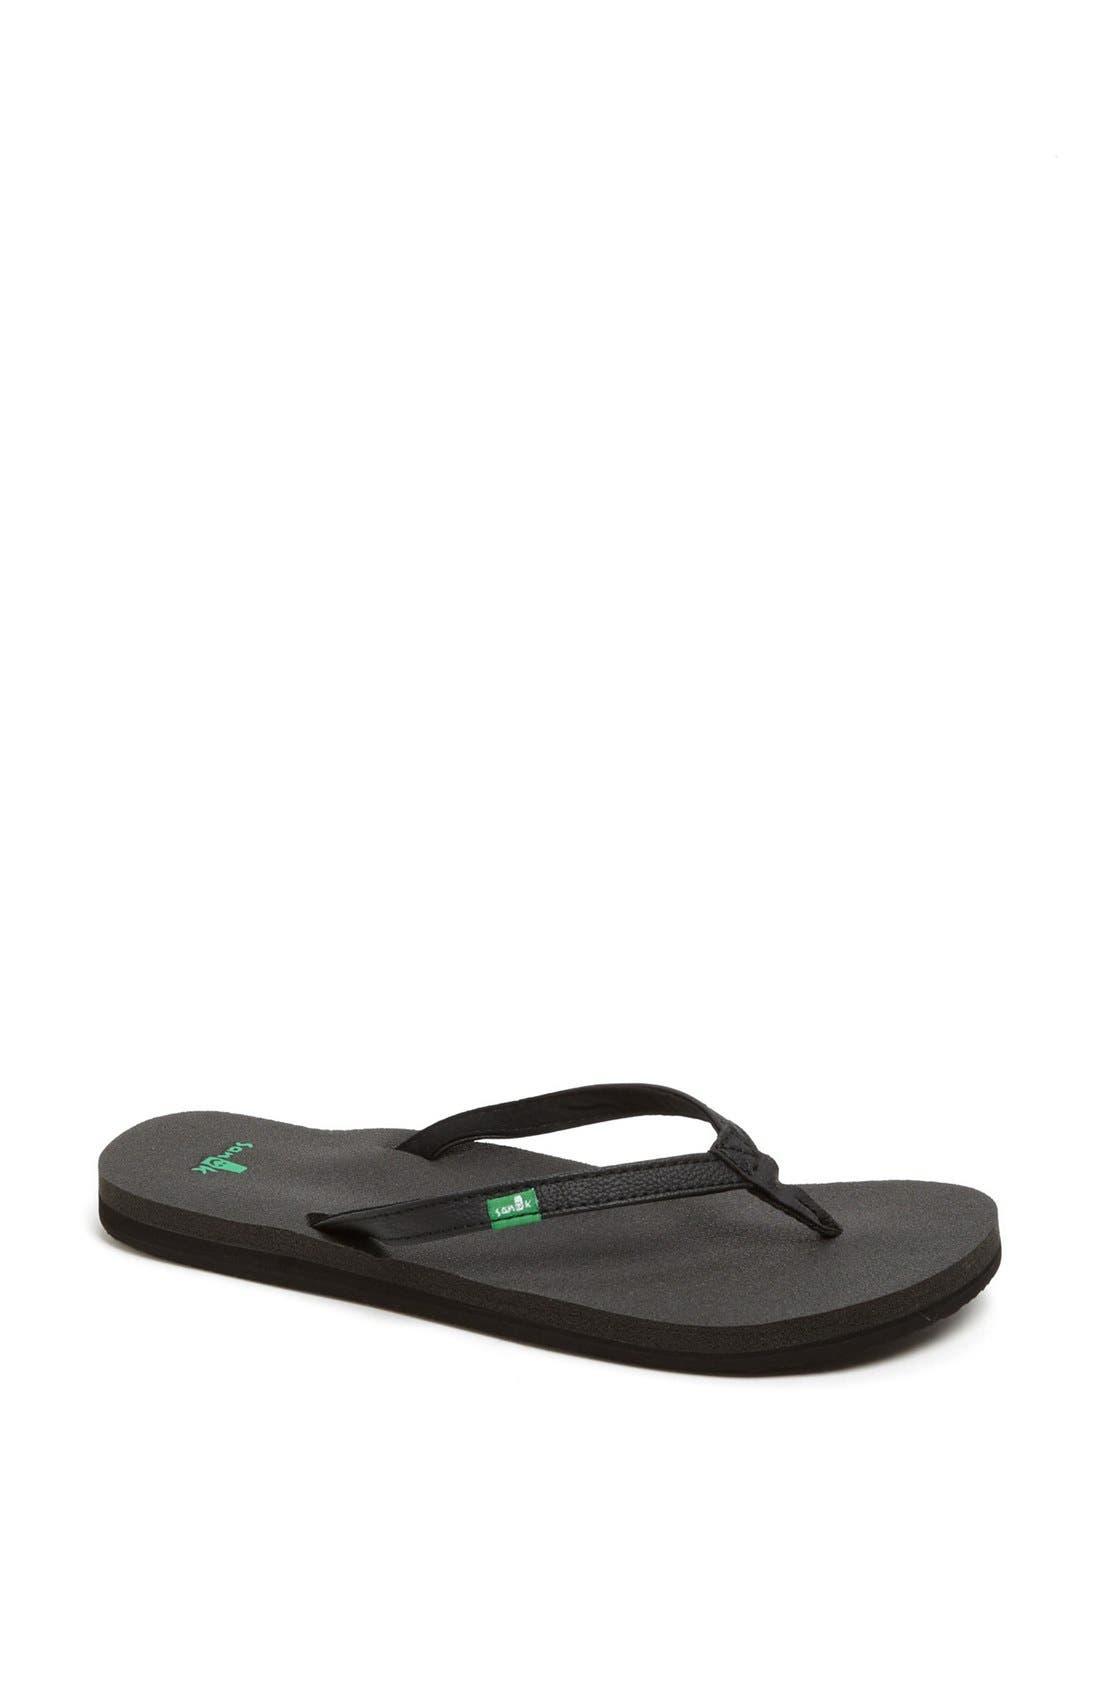 Sanuk 'Yoga Joy' Flip Flop (Women) (Regular Retail Price: $29.95